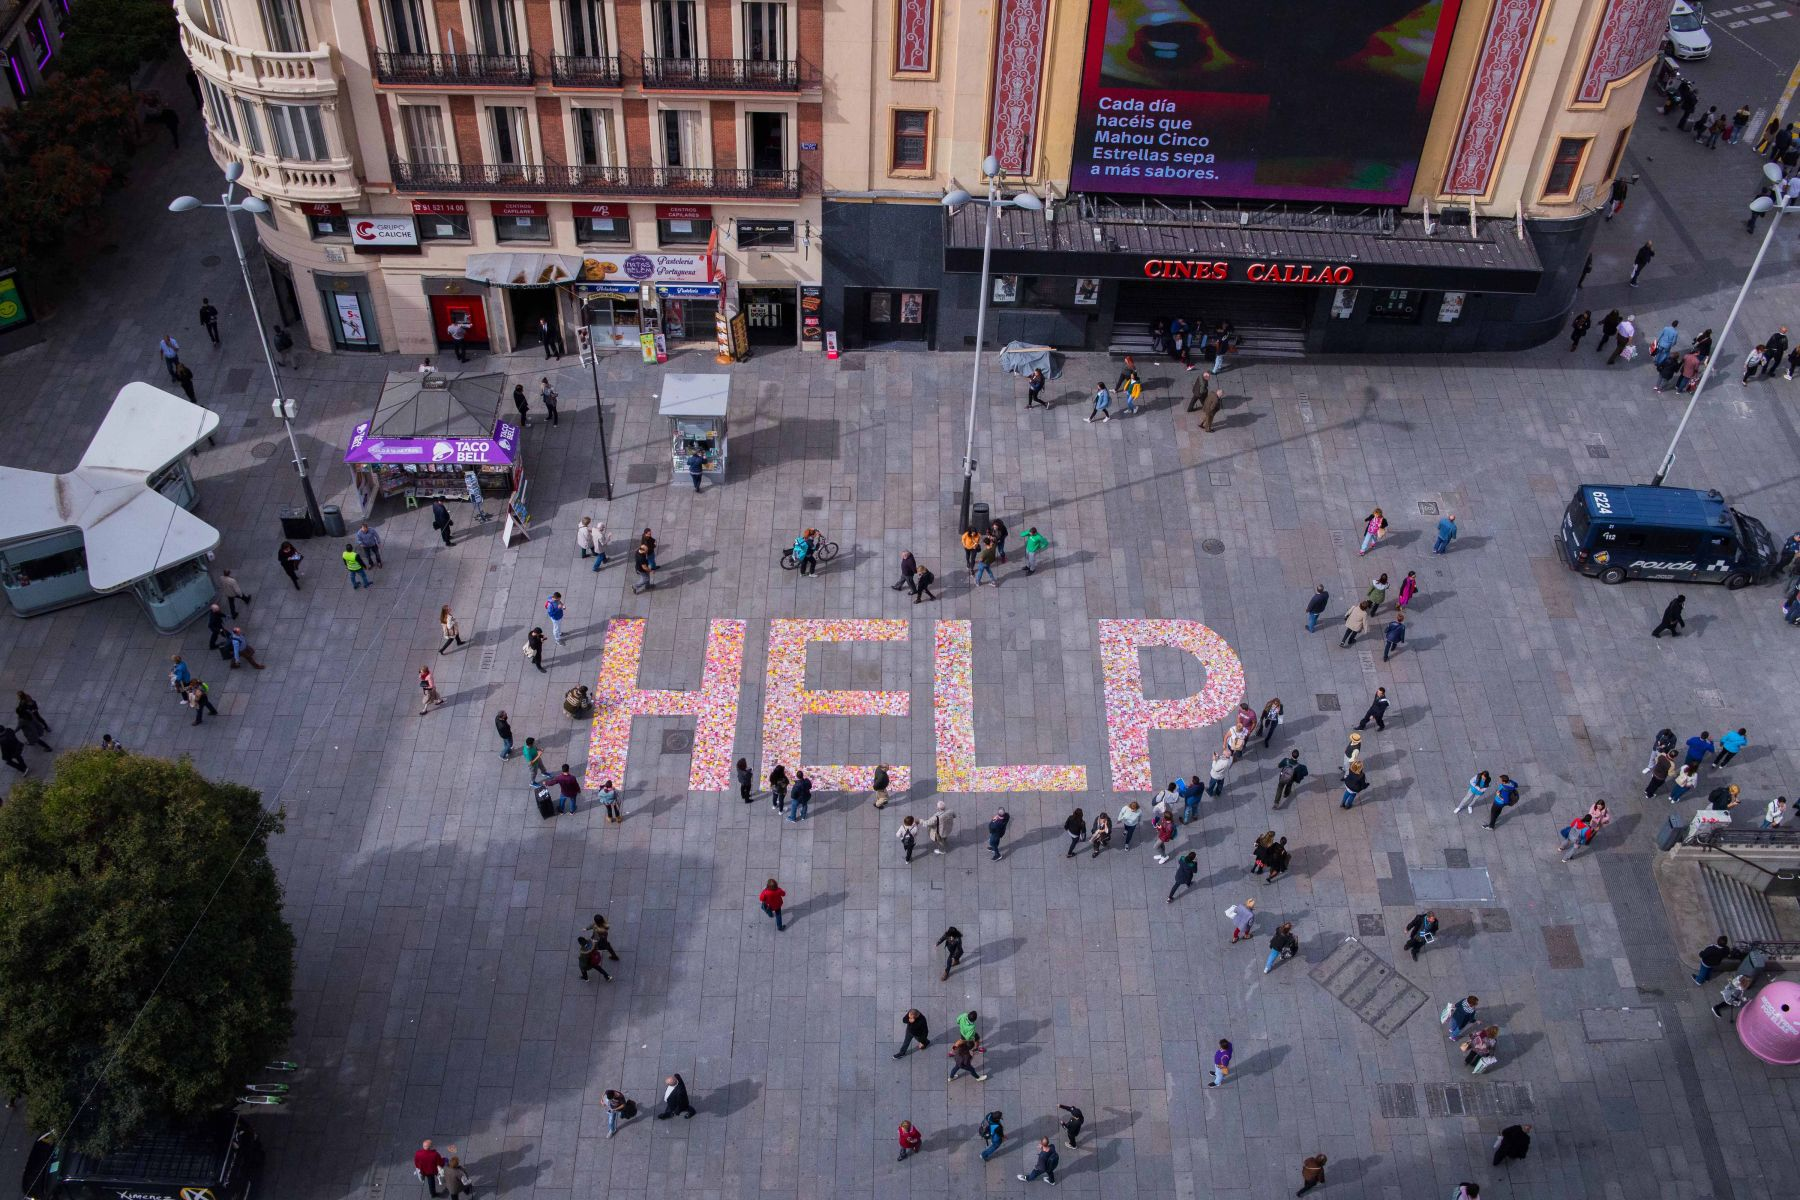 HELP (2018) - Yolanda Domínguez